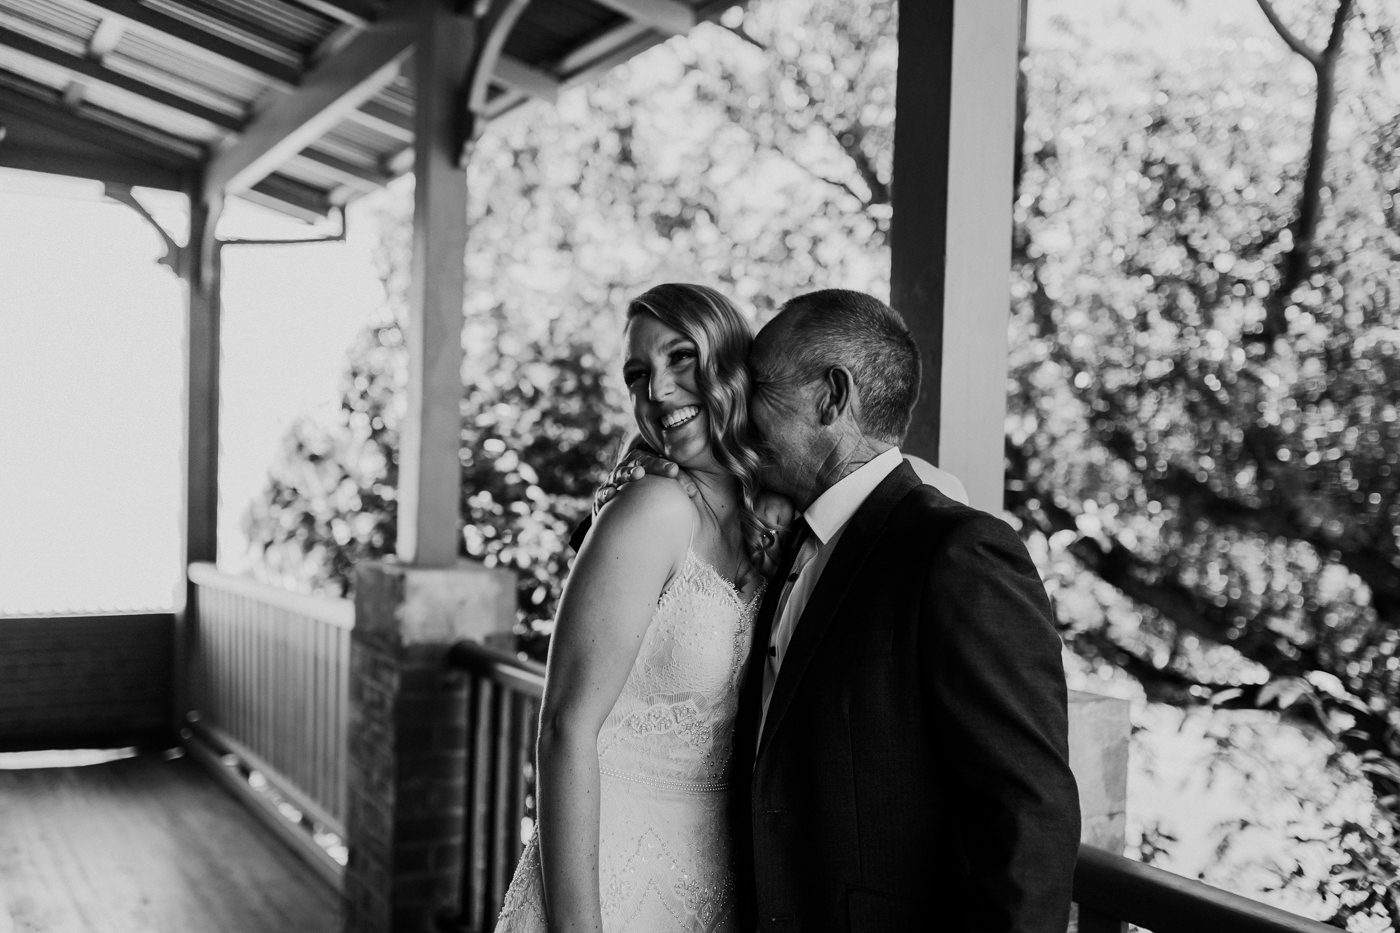 Anthony & Eliet - Wagga Wagga Wedding - Country NSW - Samantha Heather Photography-29.jpg